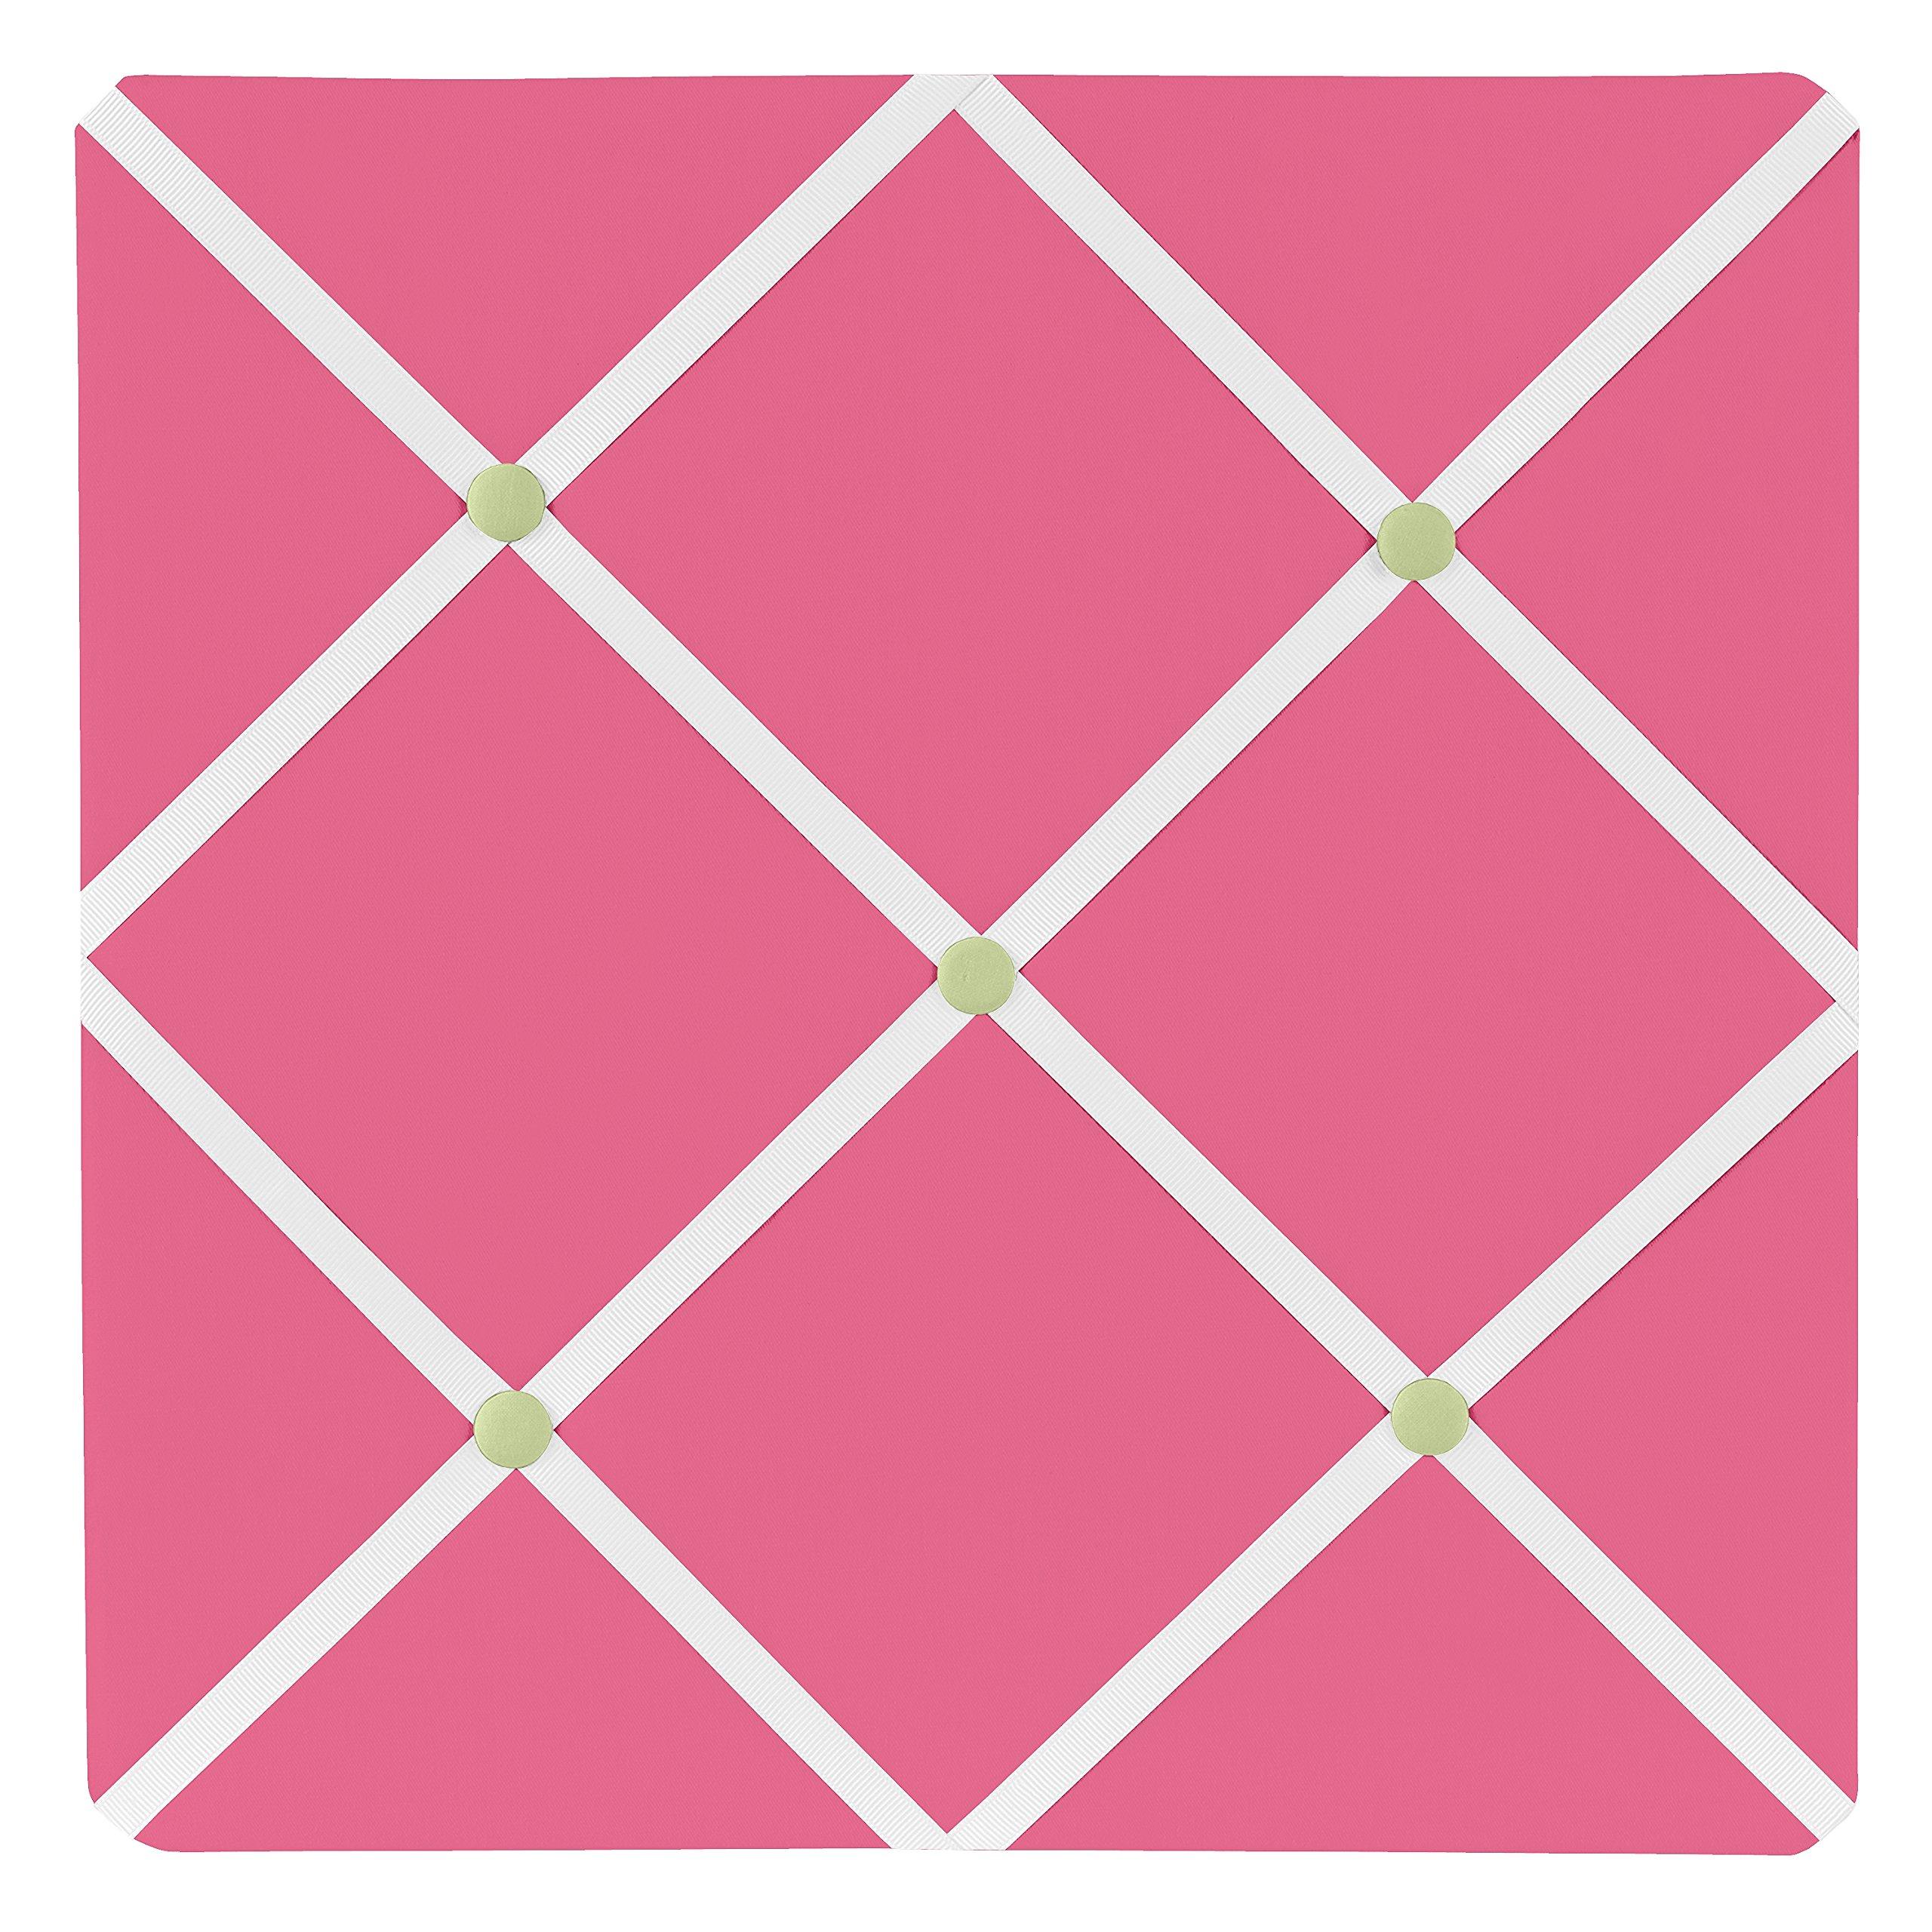 Sweet Jojo Designs Pink and Green Flower Fabric Memory/Memo Photo Bulletin Board by Sweet Jojo Designs